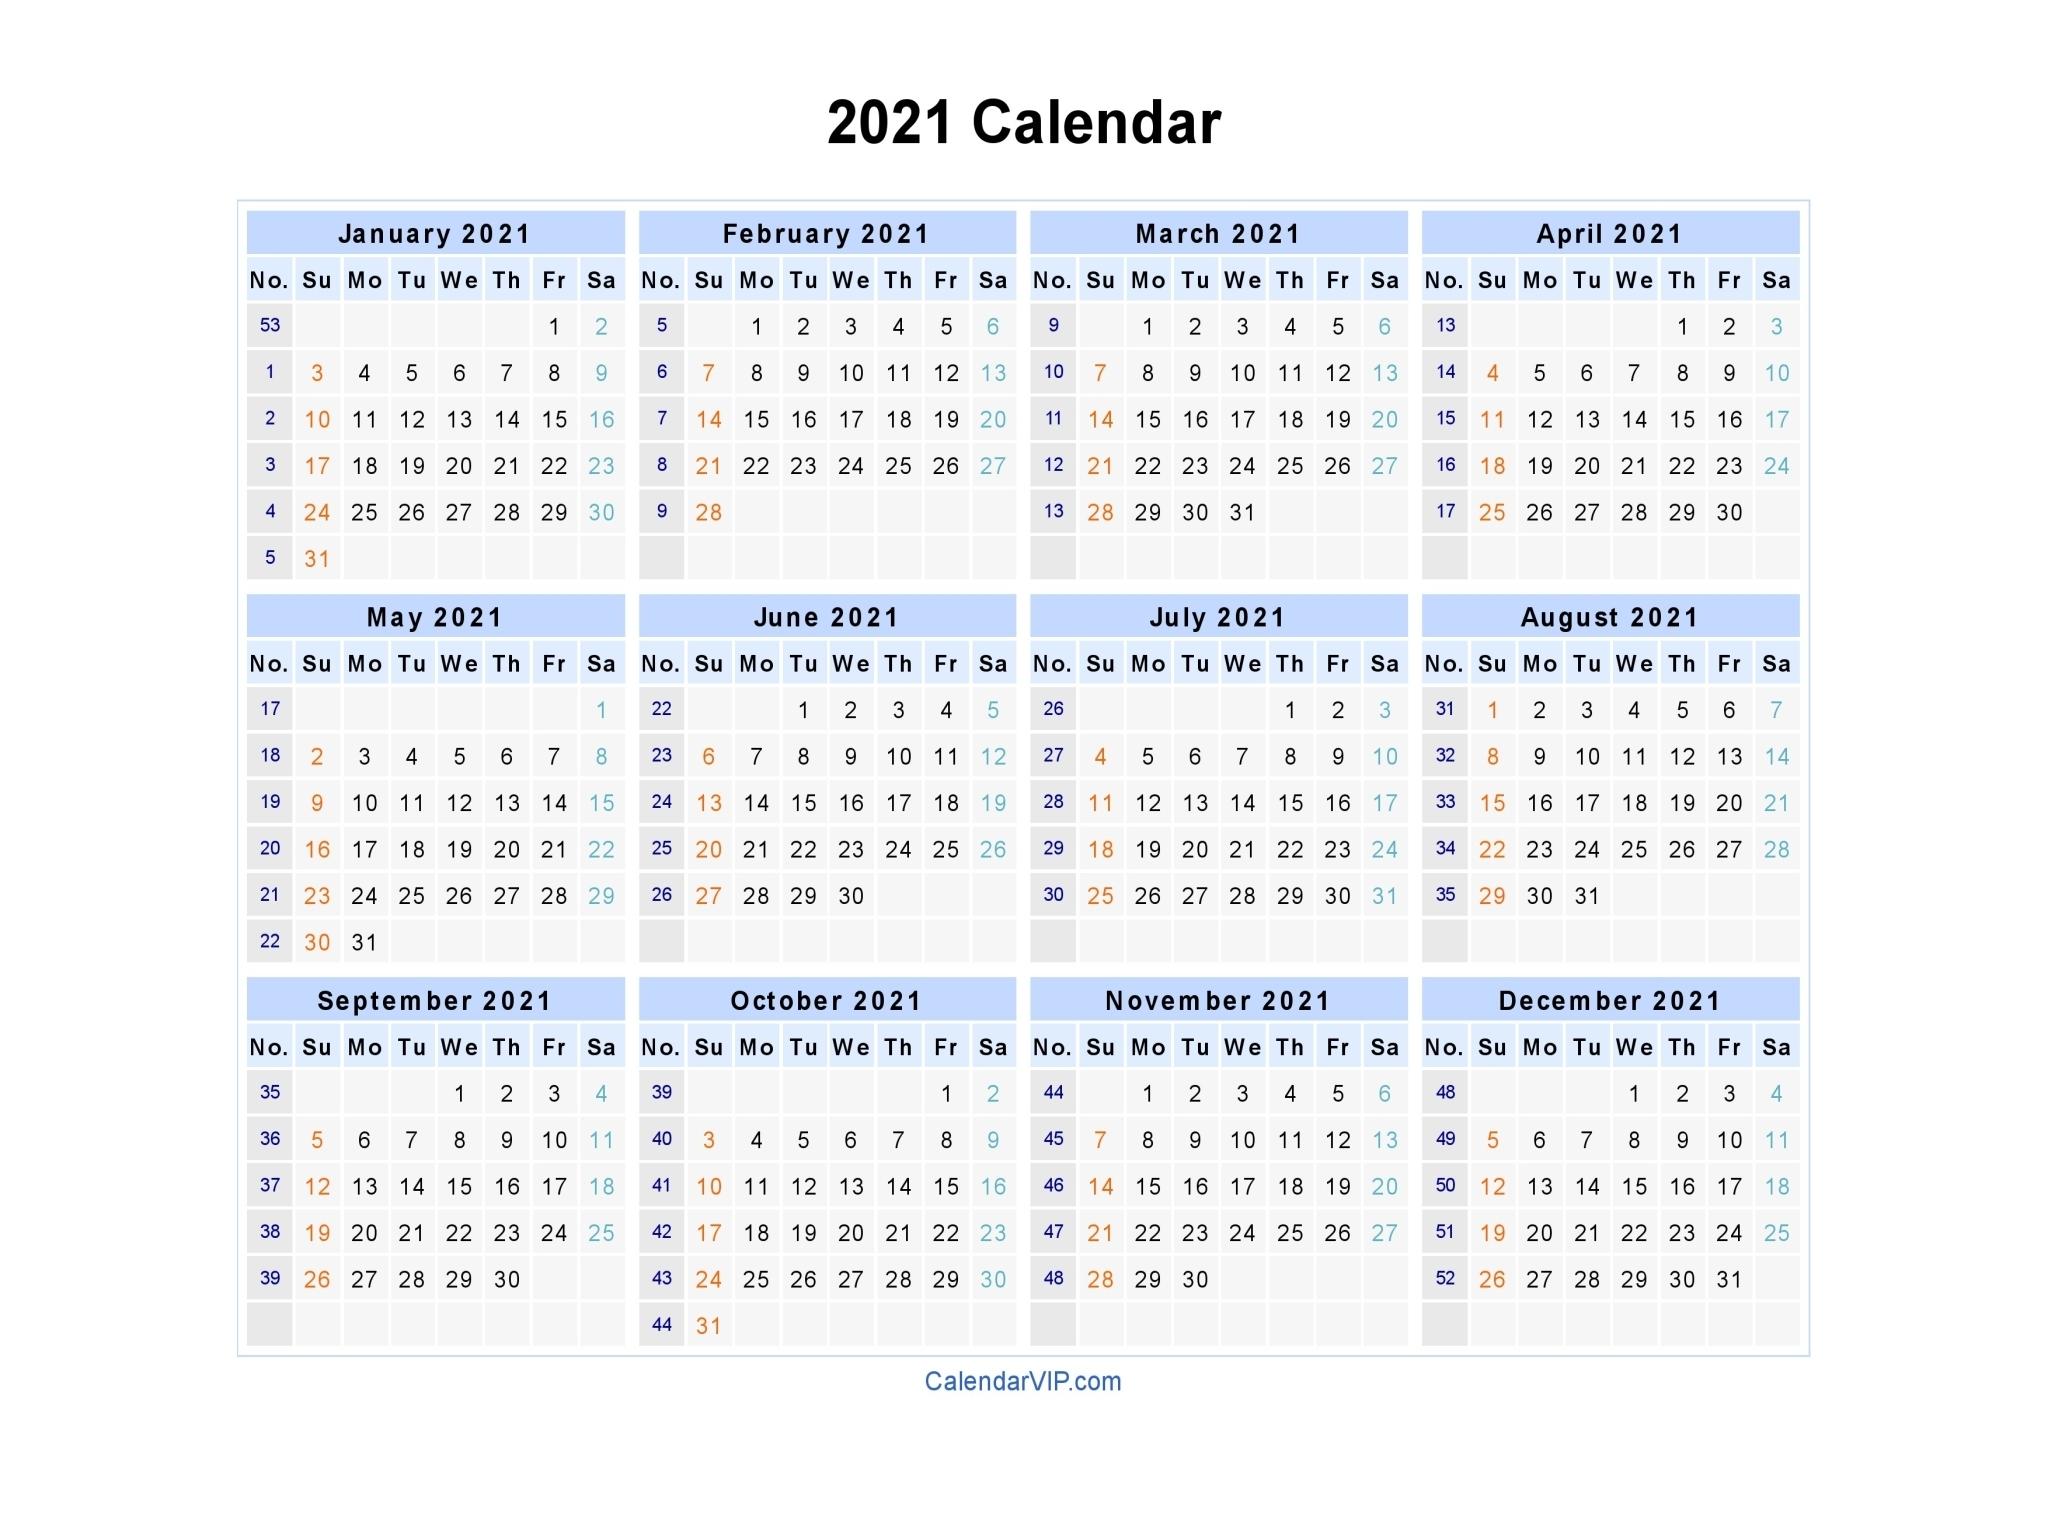 Catch Week Number 2021 Excel